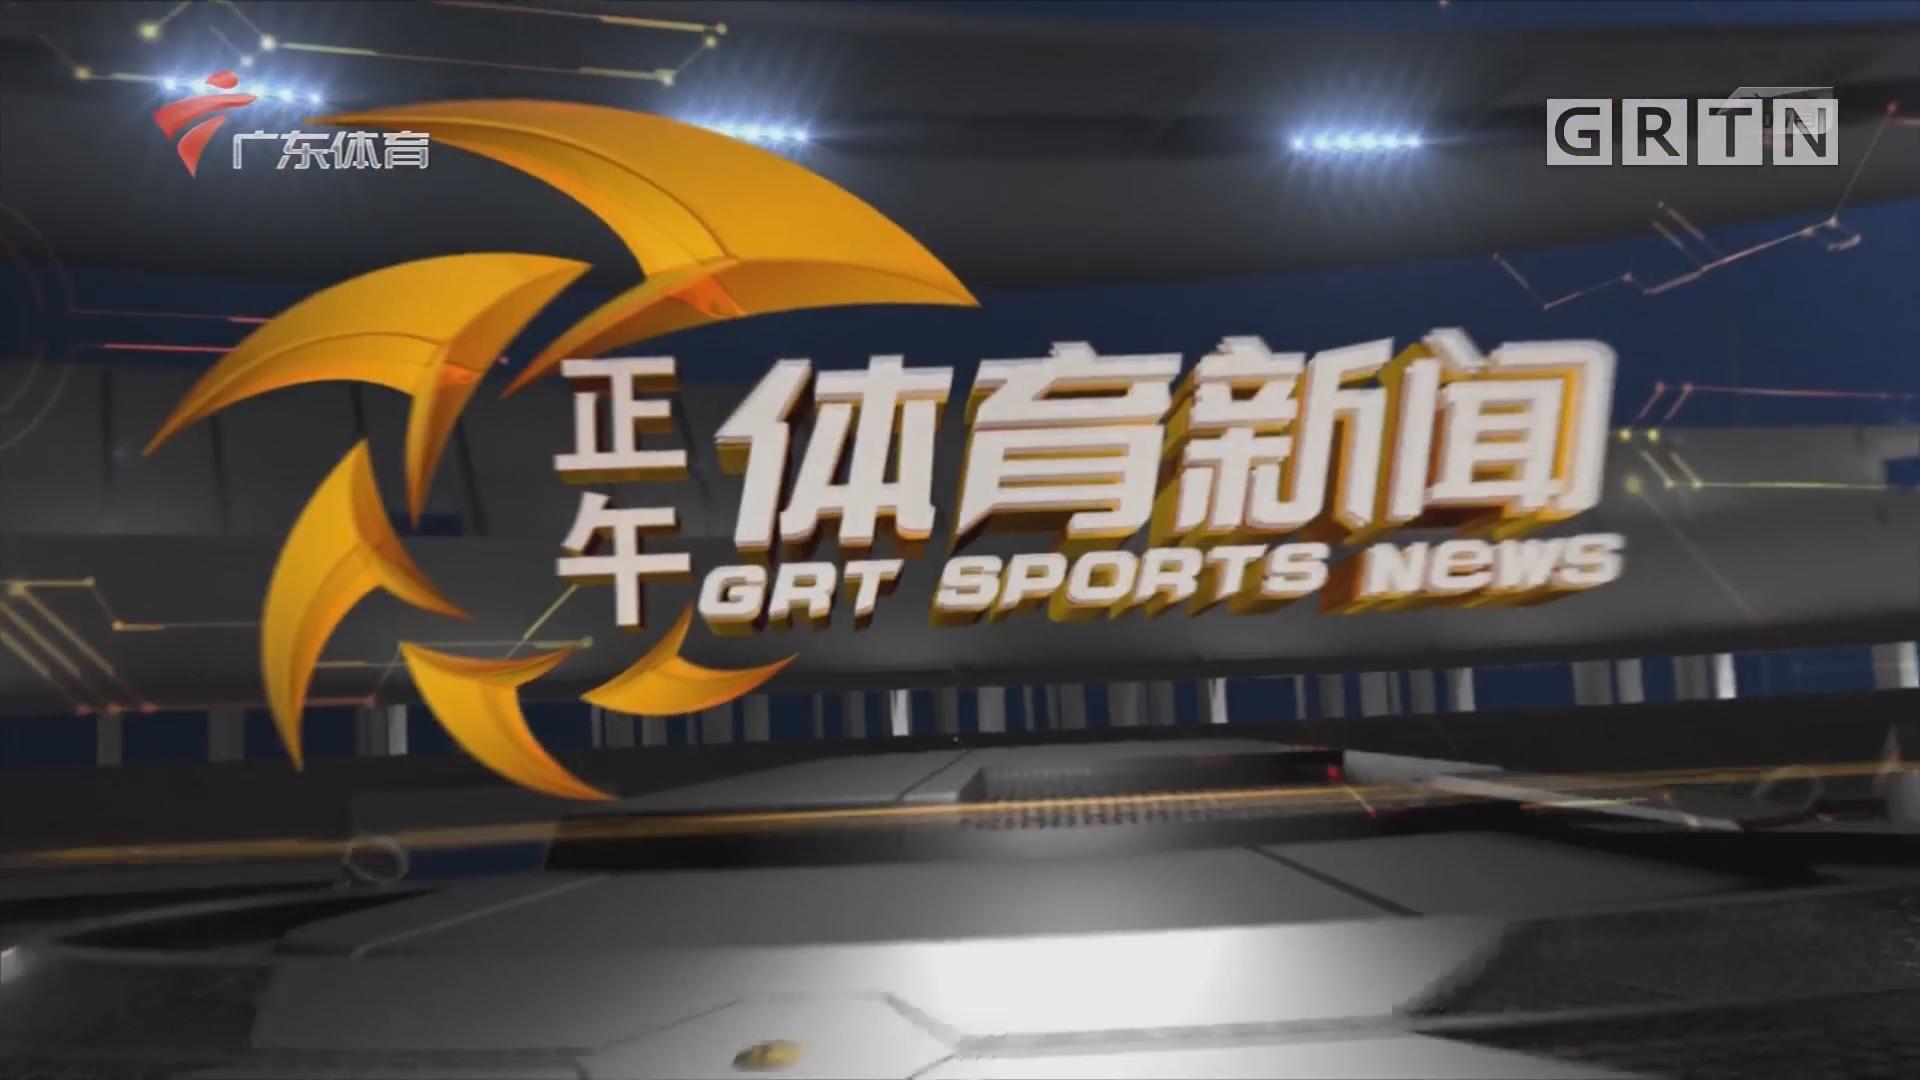 [HD][2020-02-25]正午体育新闻:关于延期举办2020世界乒乓球团体锦标赛的通知